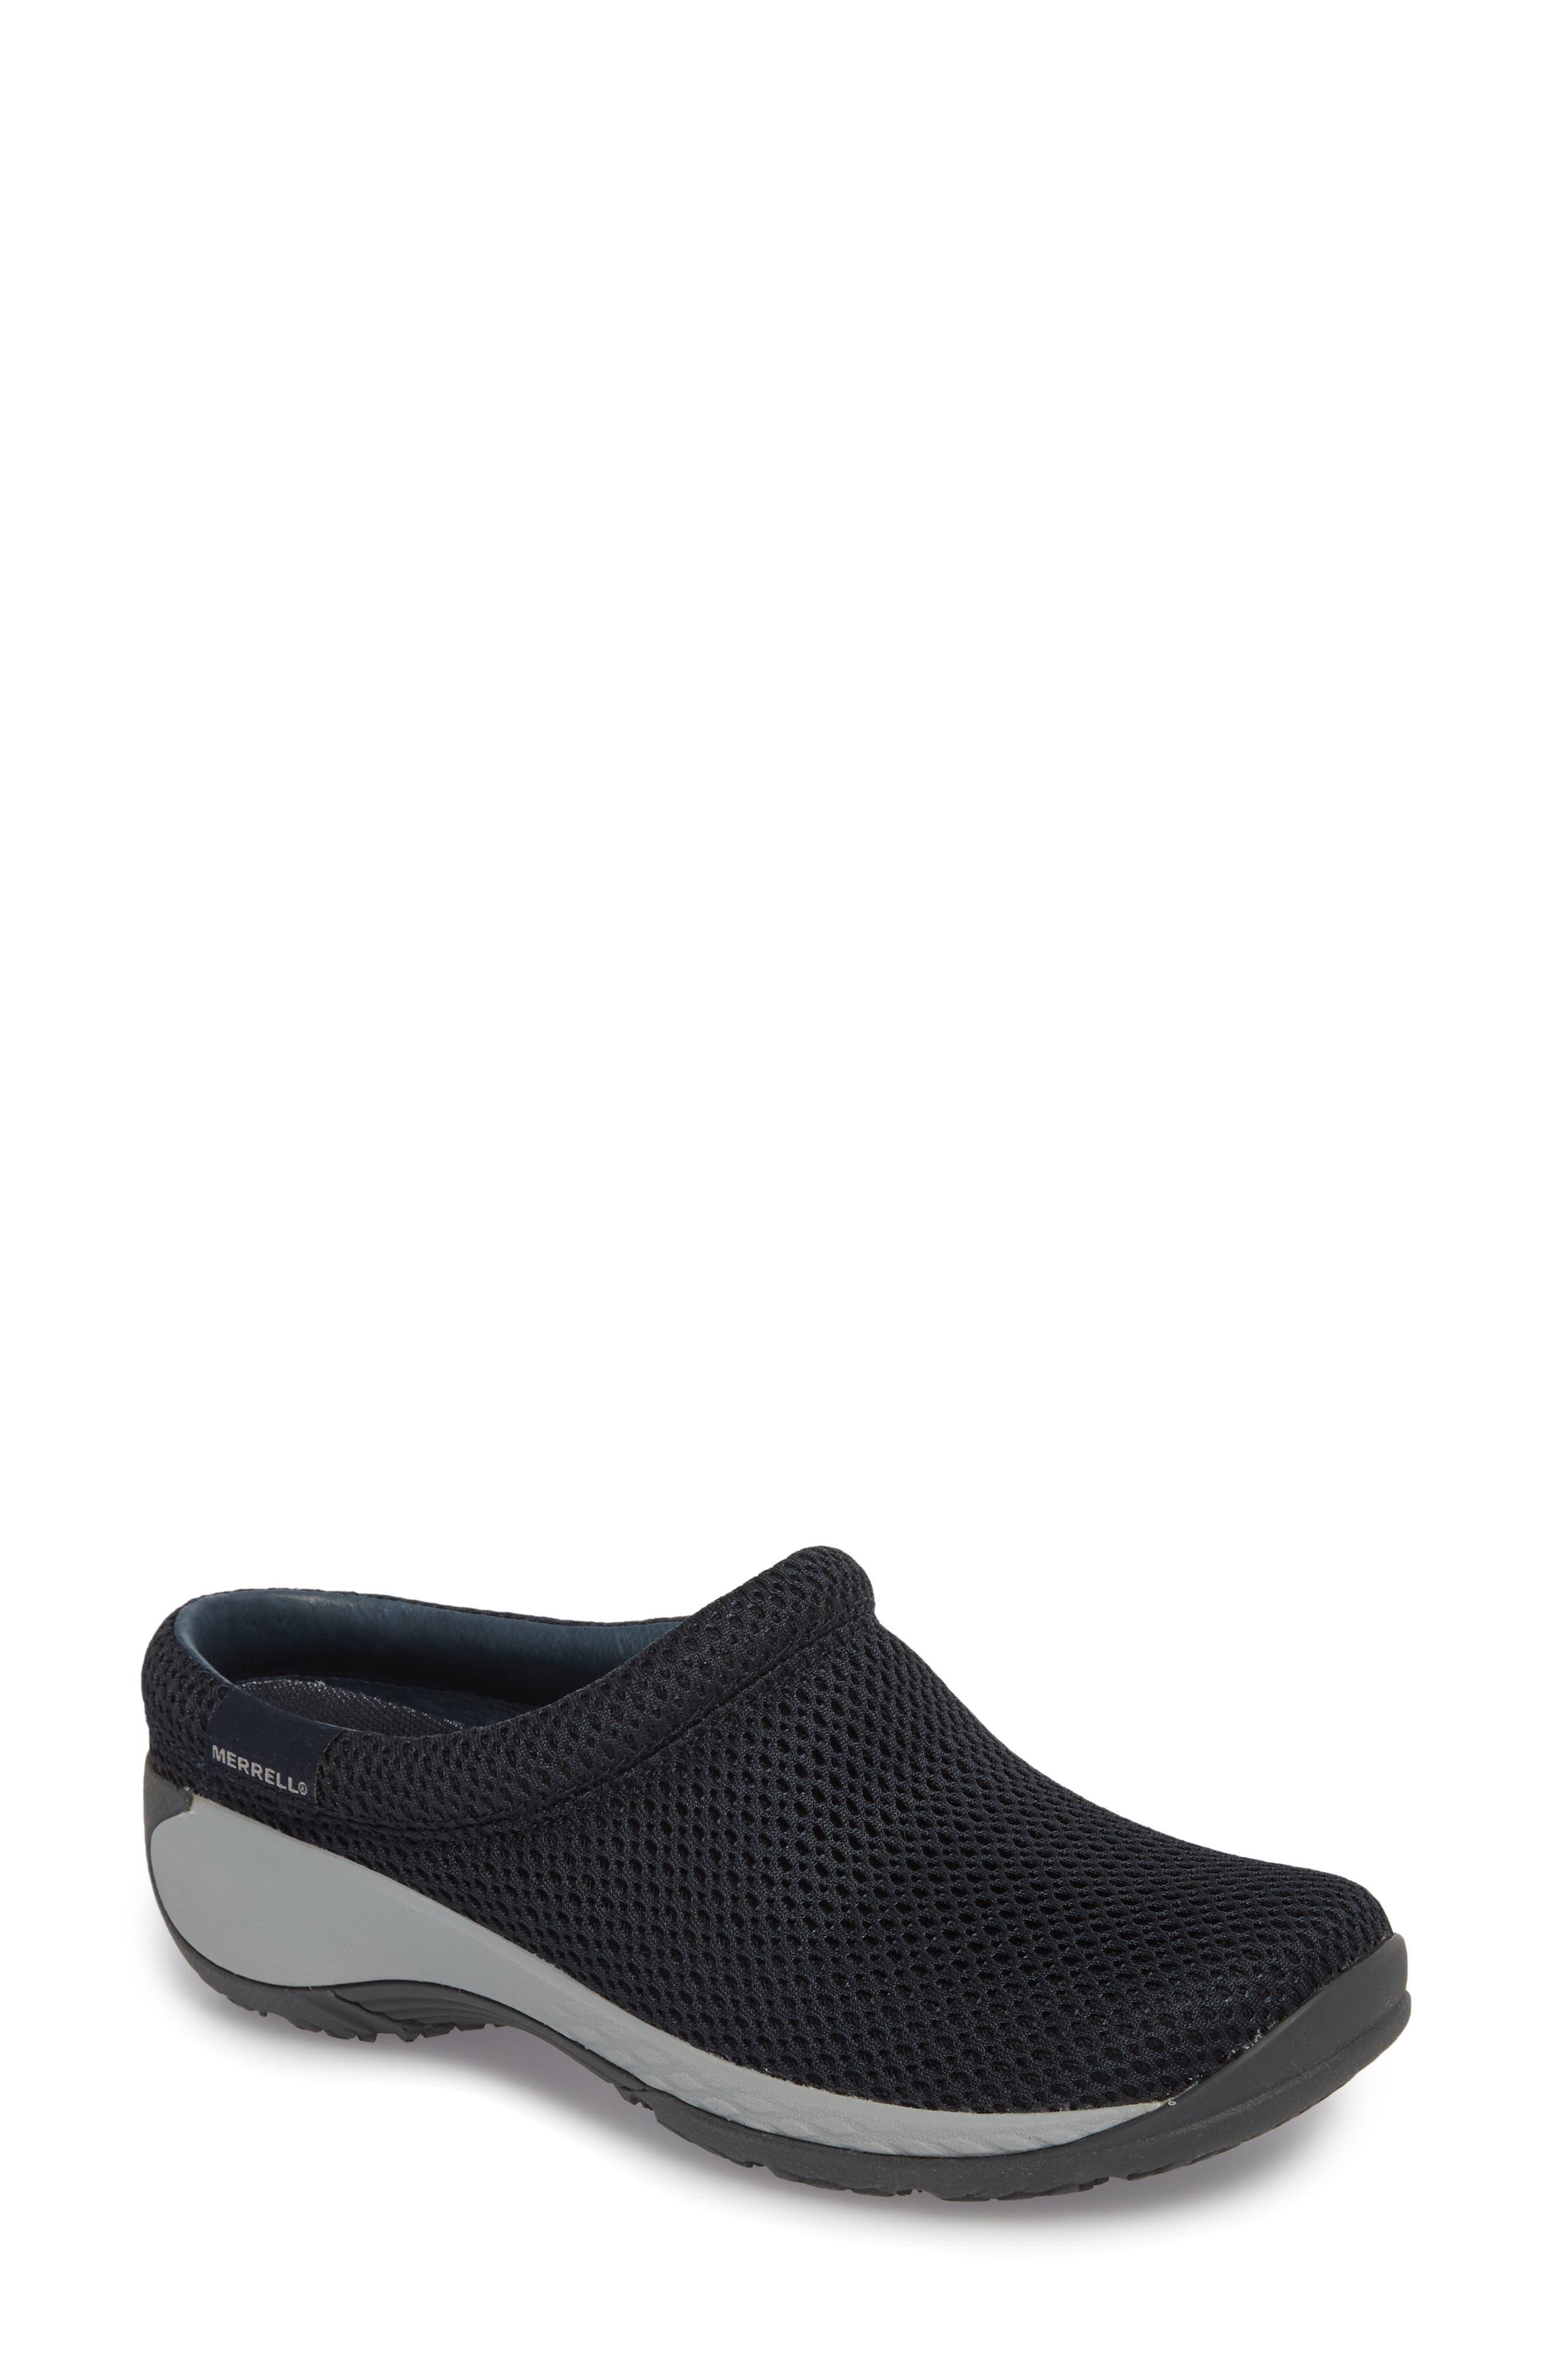 f2daae626030 Women s Merrell Shoes